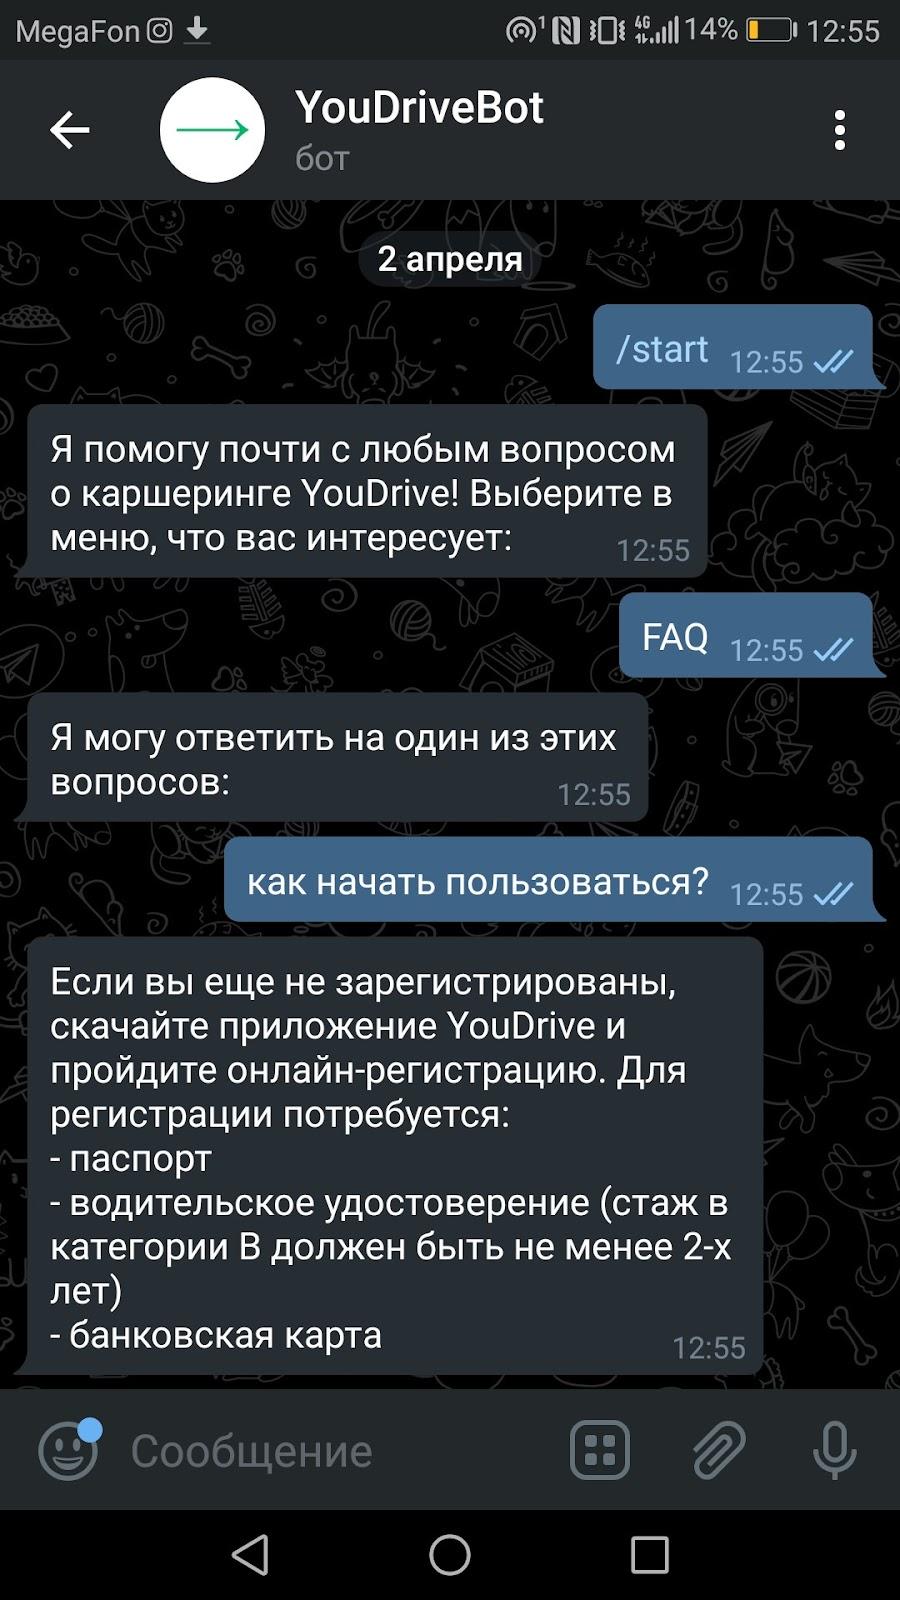 YouDriveBot